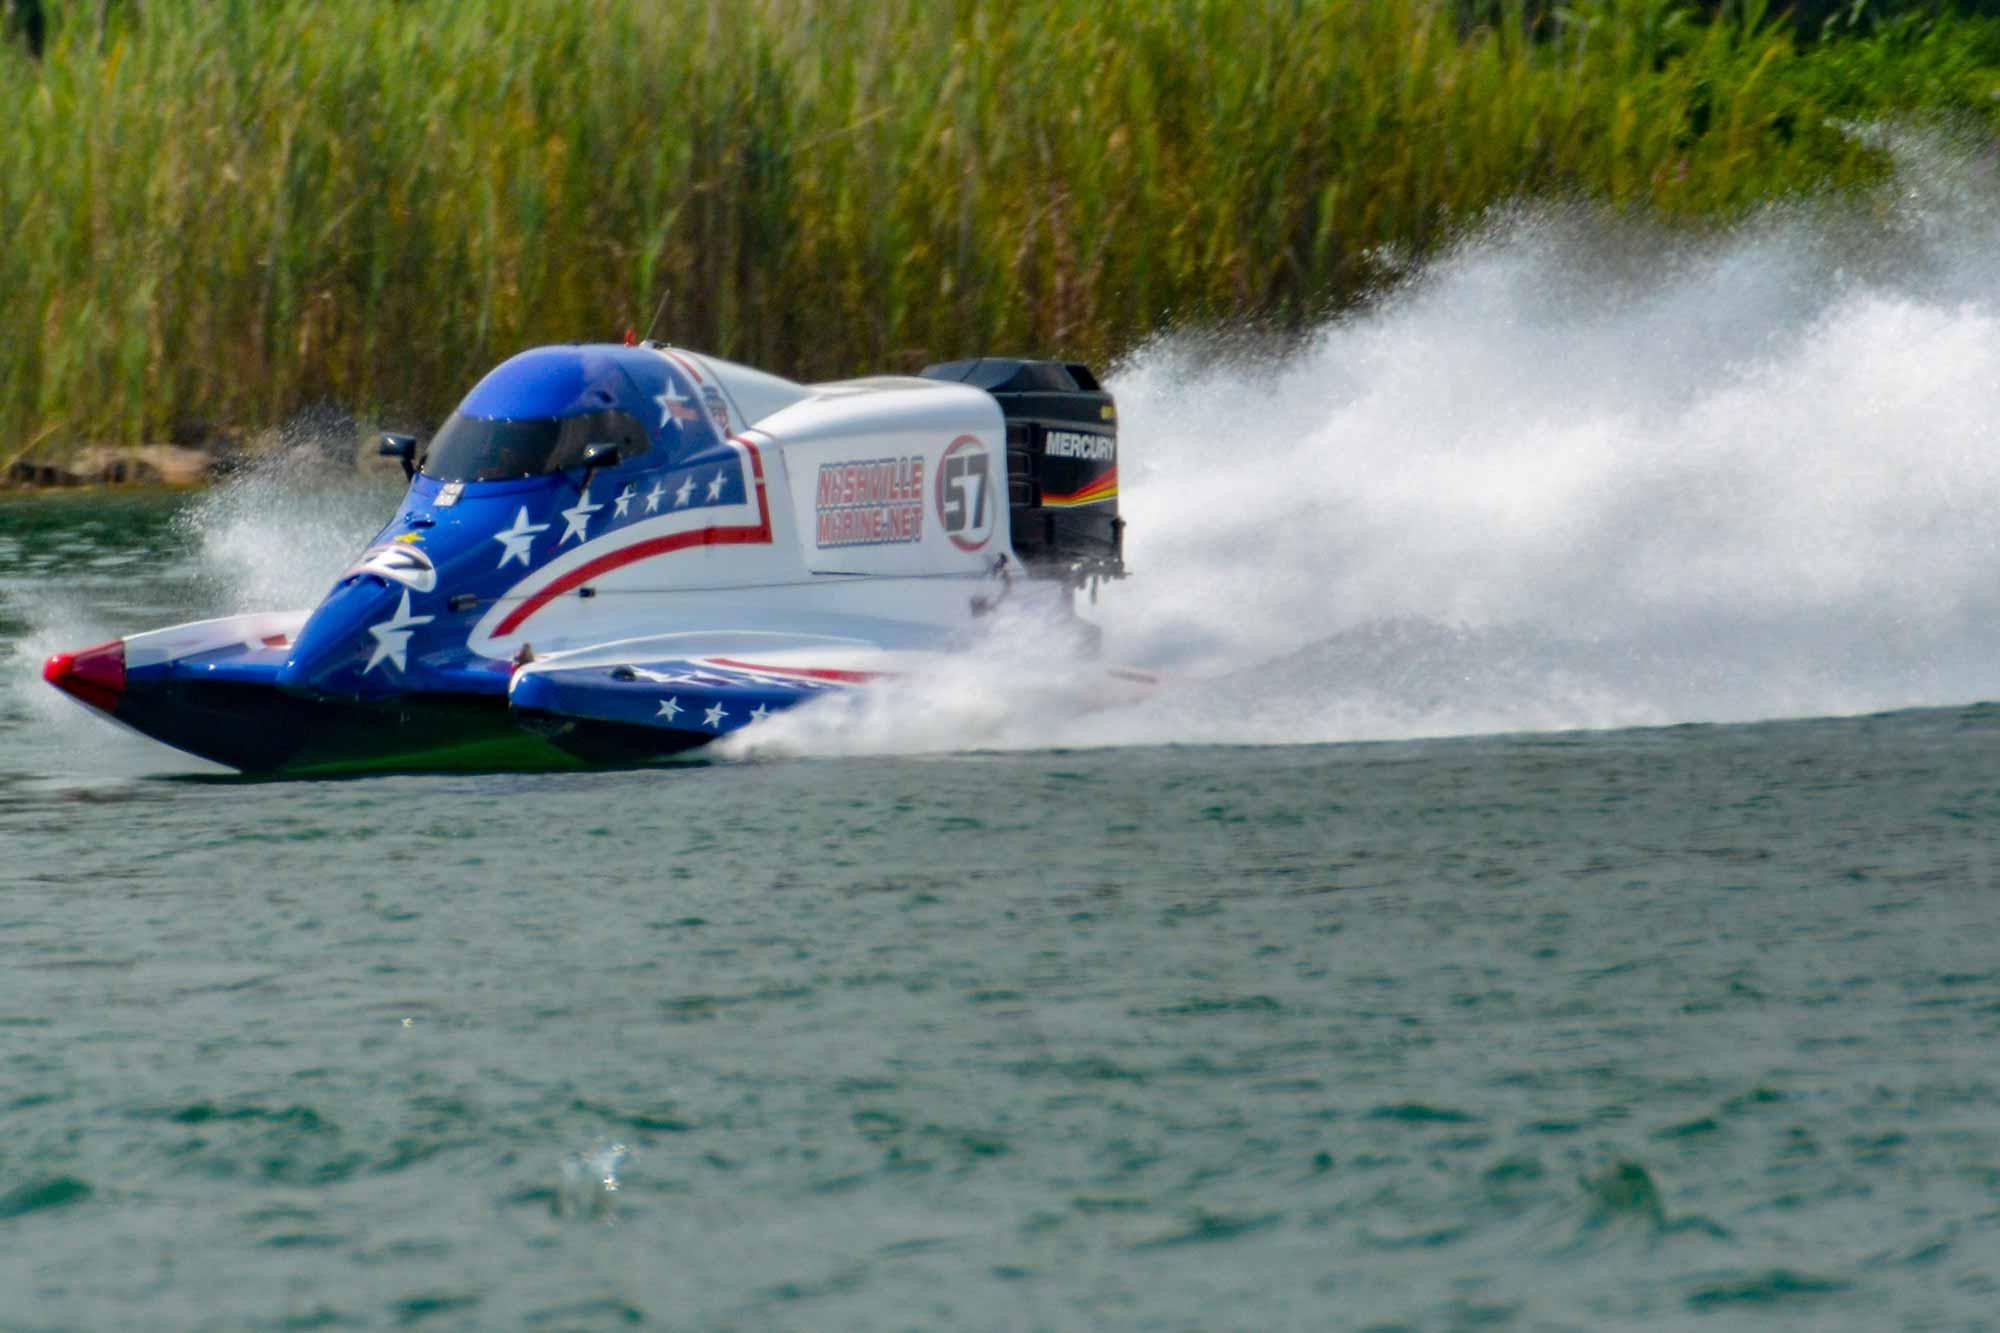 McMurray-Racing-Nashvill-Marine-2021-Springfield-F1-Race-17